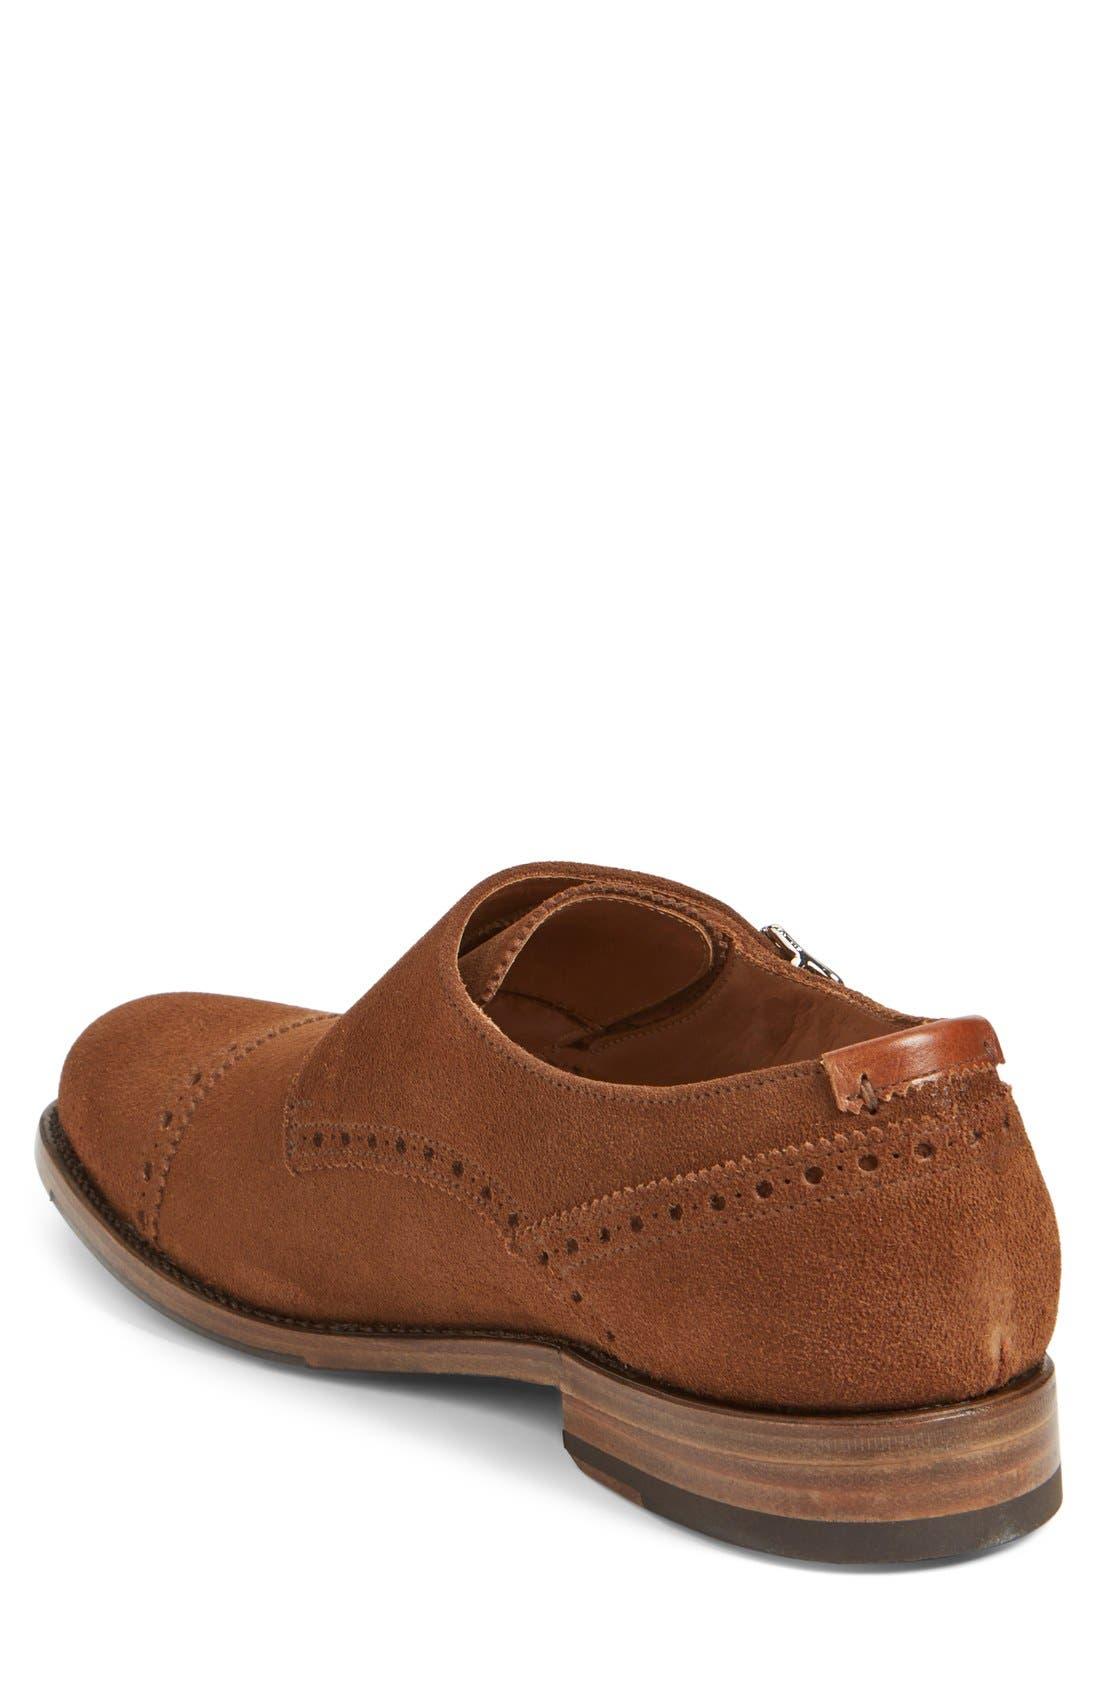 'Fallon' Weatherproof Monk Strap Shoe,                             Alternate thumbnail 14, color,